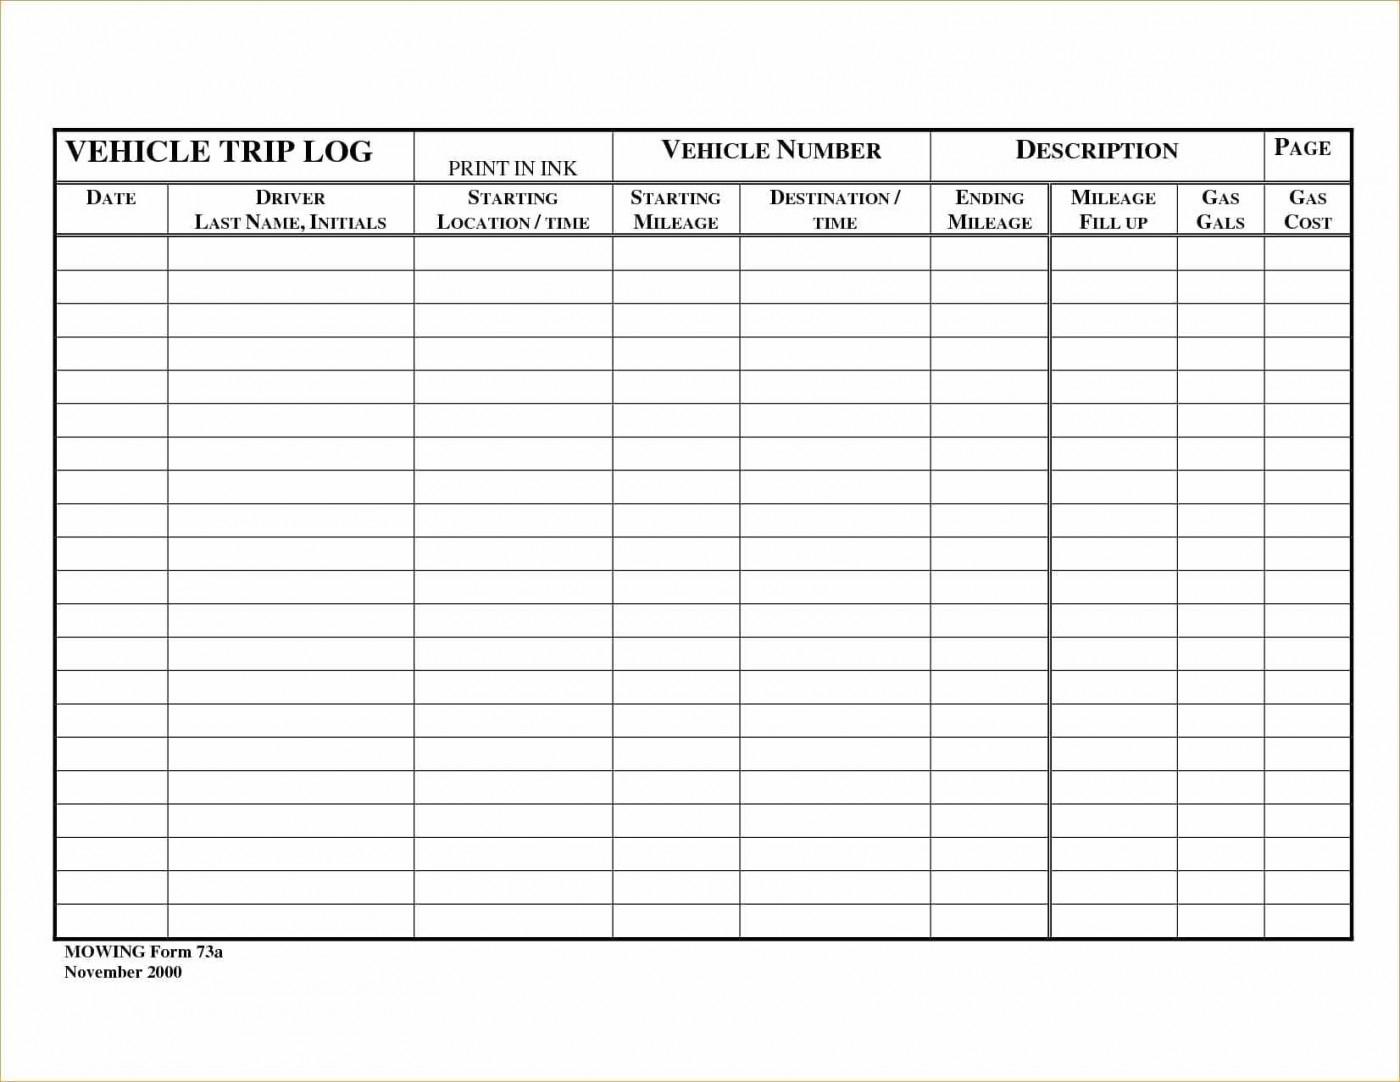 Preventive Maintenance Spreadsheet Template With Regard To 023 Service Request Template Excel Preventive Maintenance